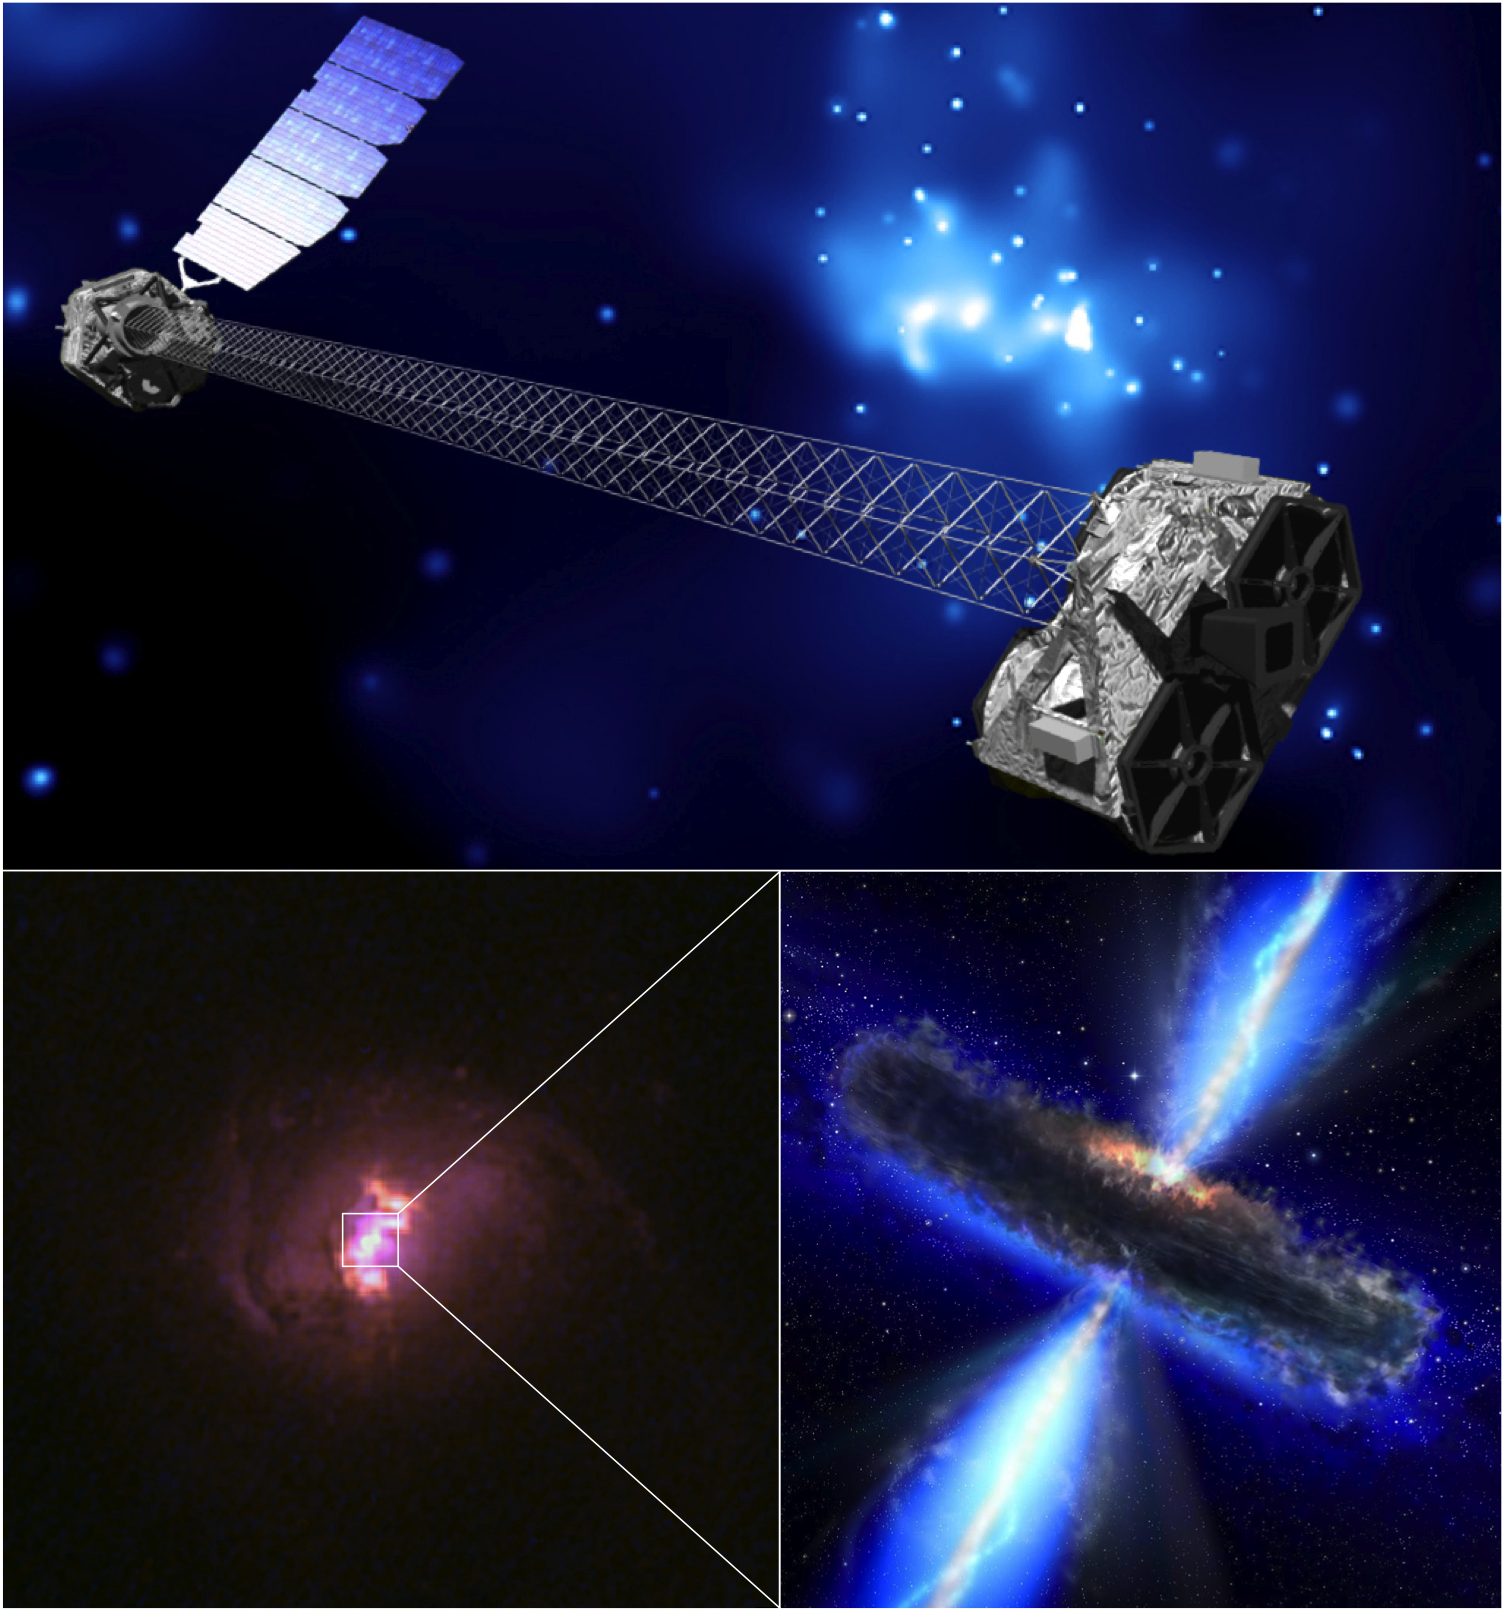 NuSTAR Stares Deep into Hidden Lairs of Black Holes